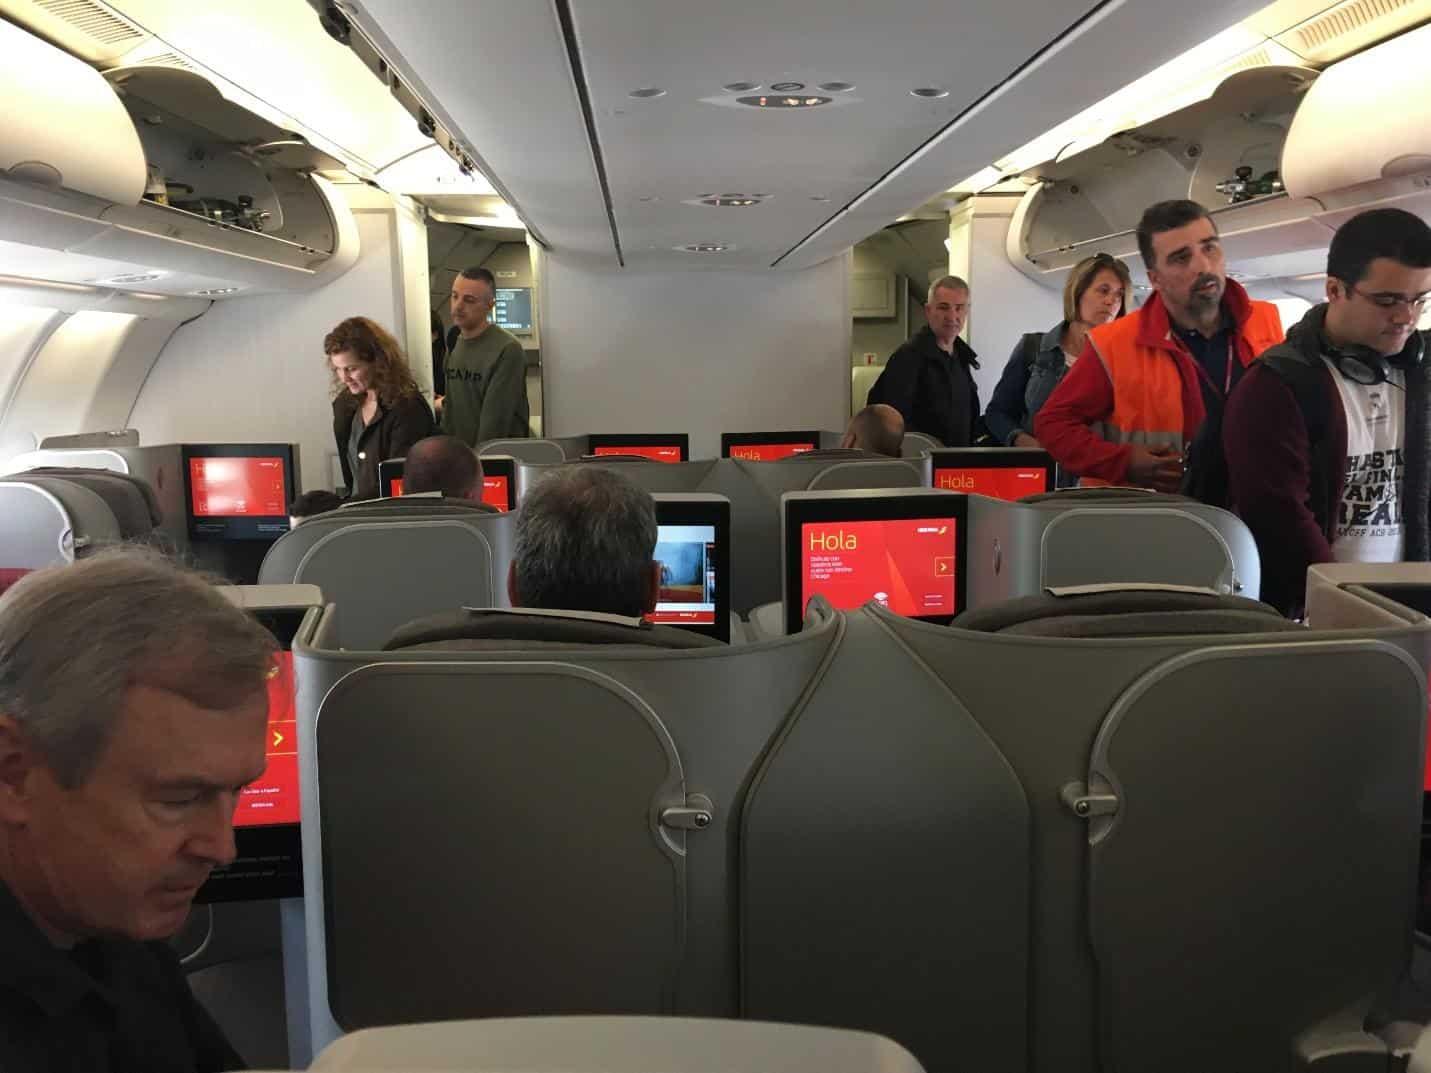 Iberia business class cabin